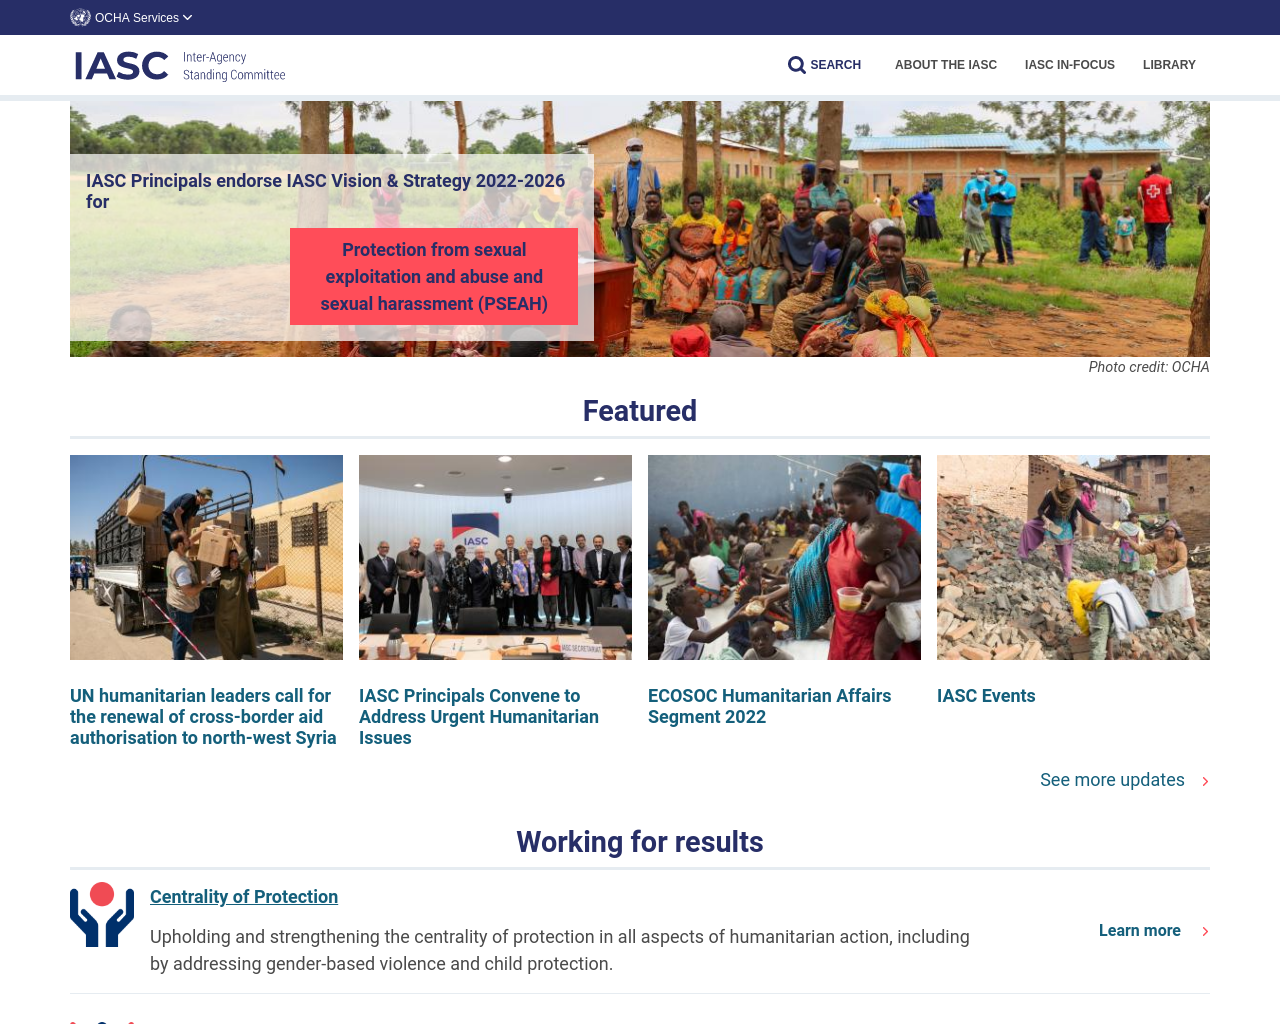 interagencystandingcommittee.org